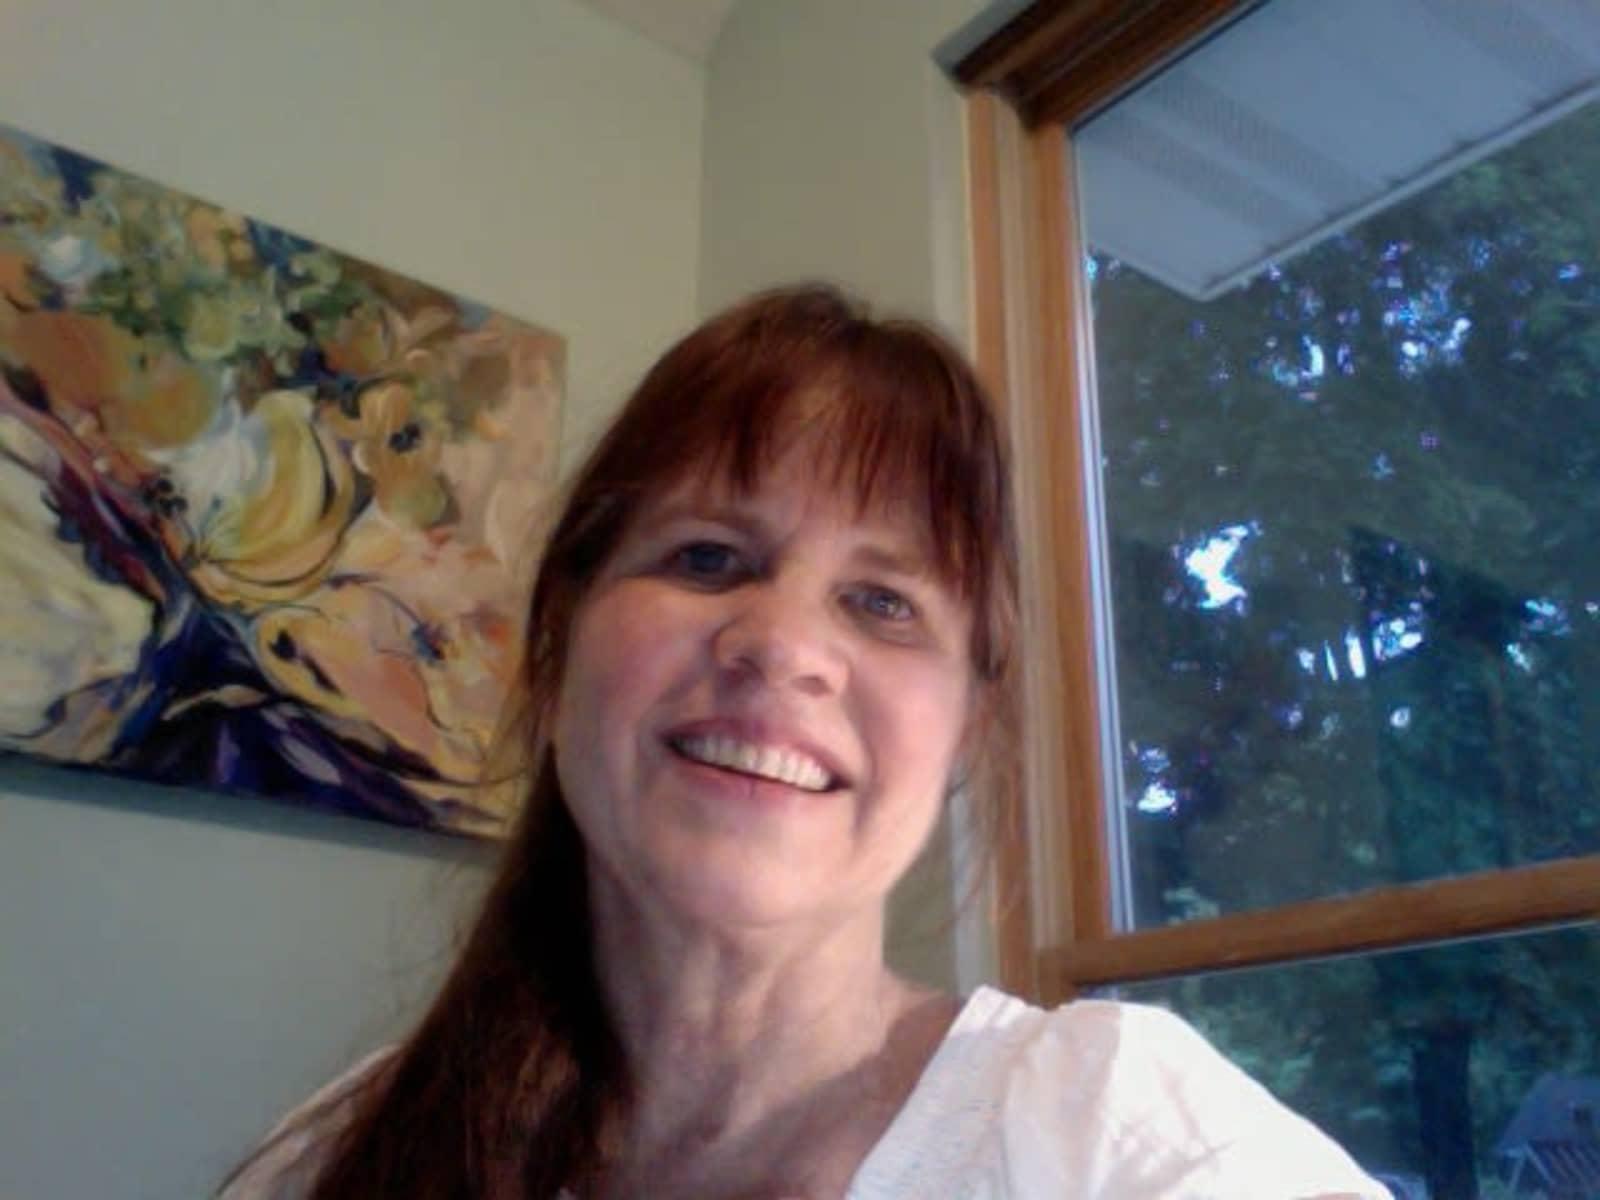 Krista from Boston, Massachusetts, United States